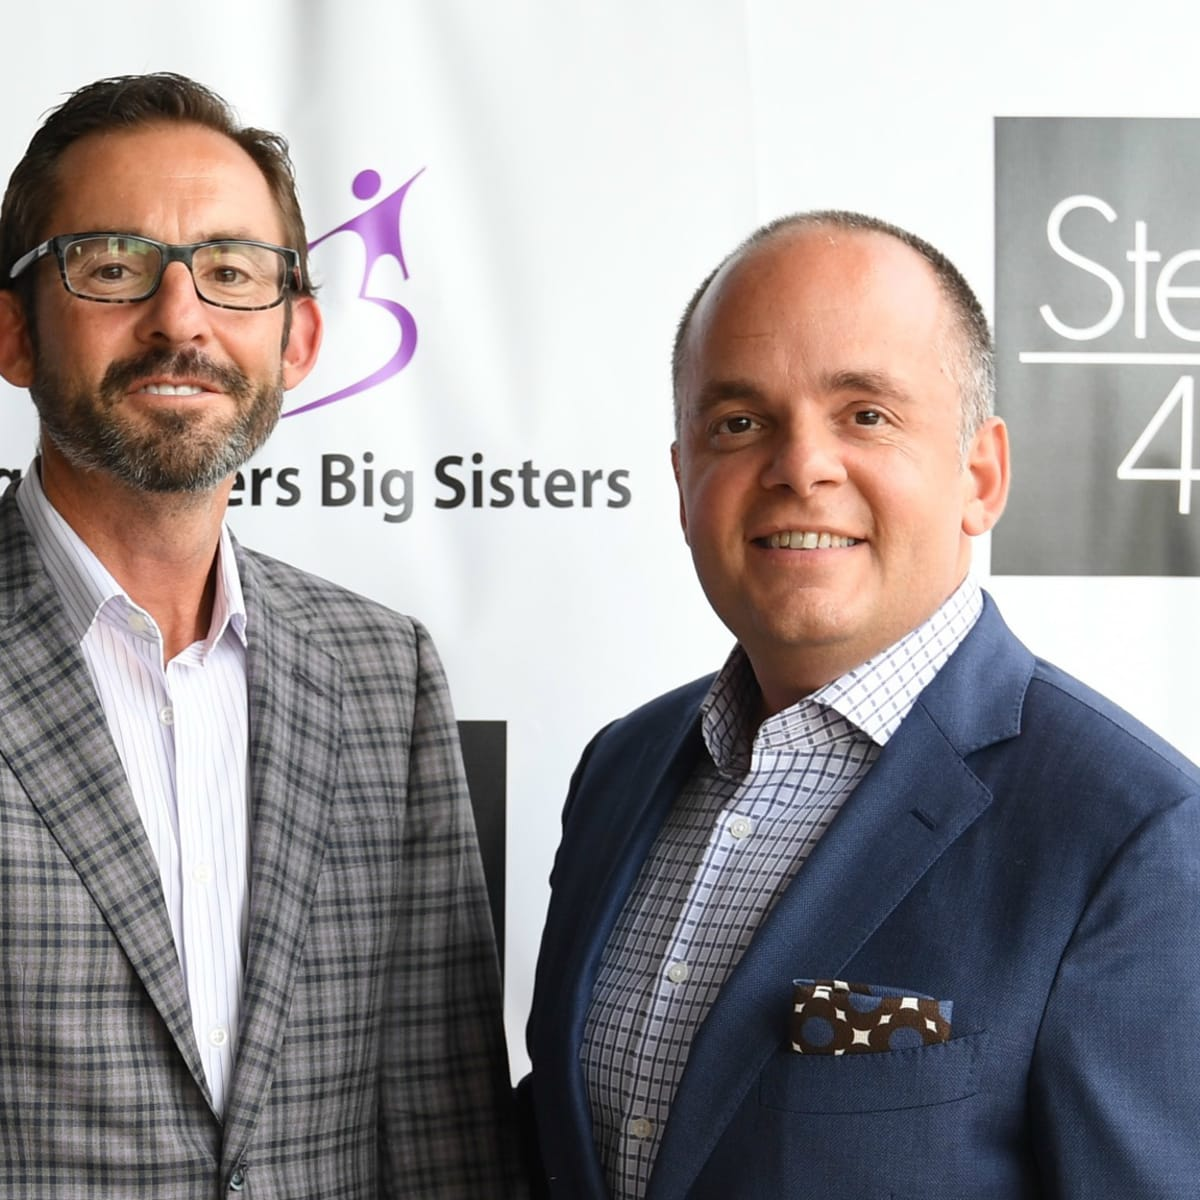 Steak 48 Opening dinners, 6/16, Jeff Mastro, Oliver Badgio